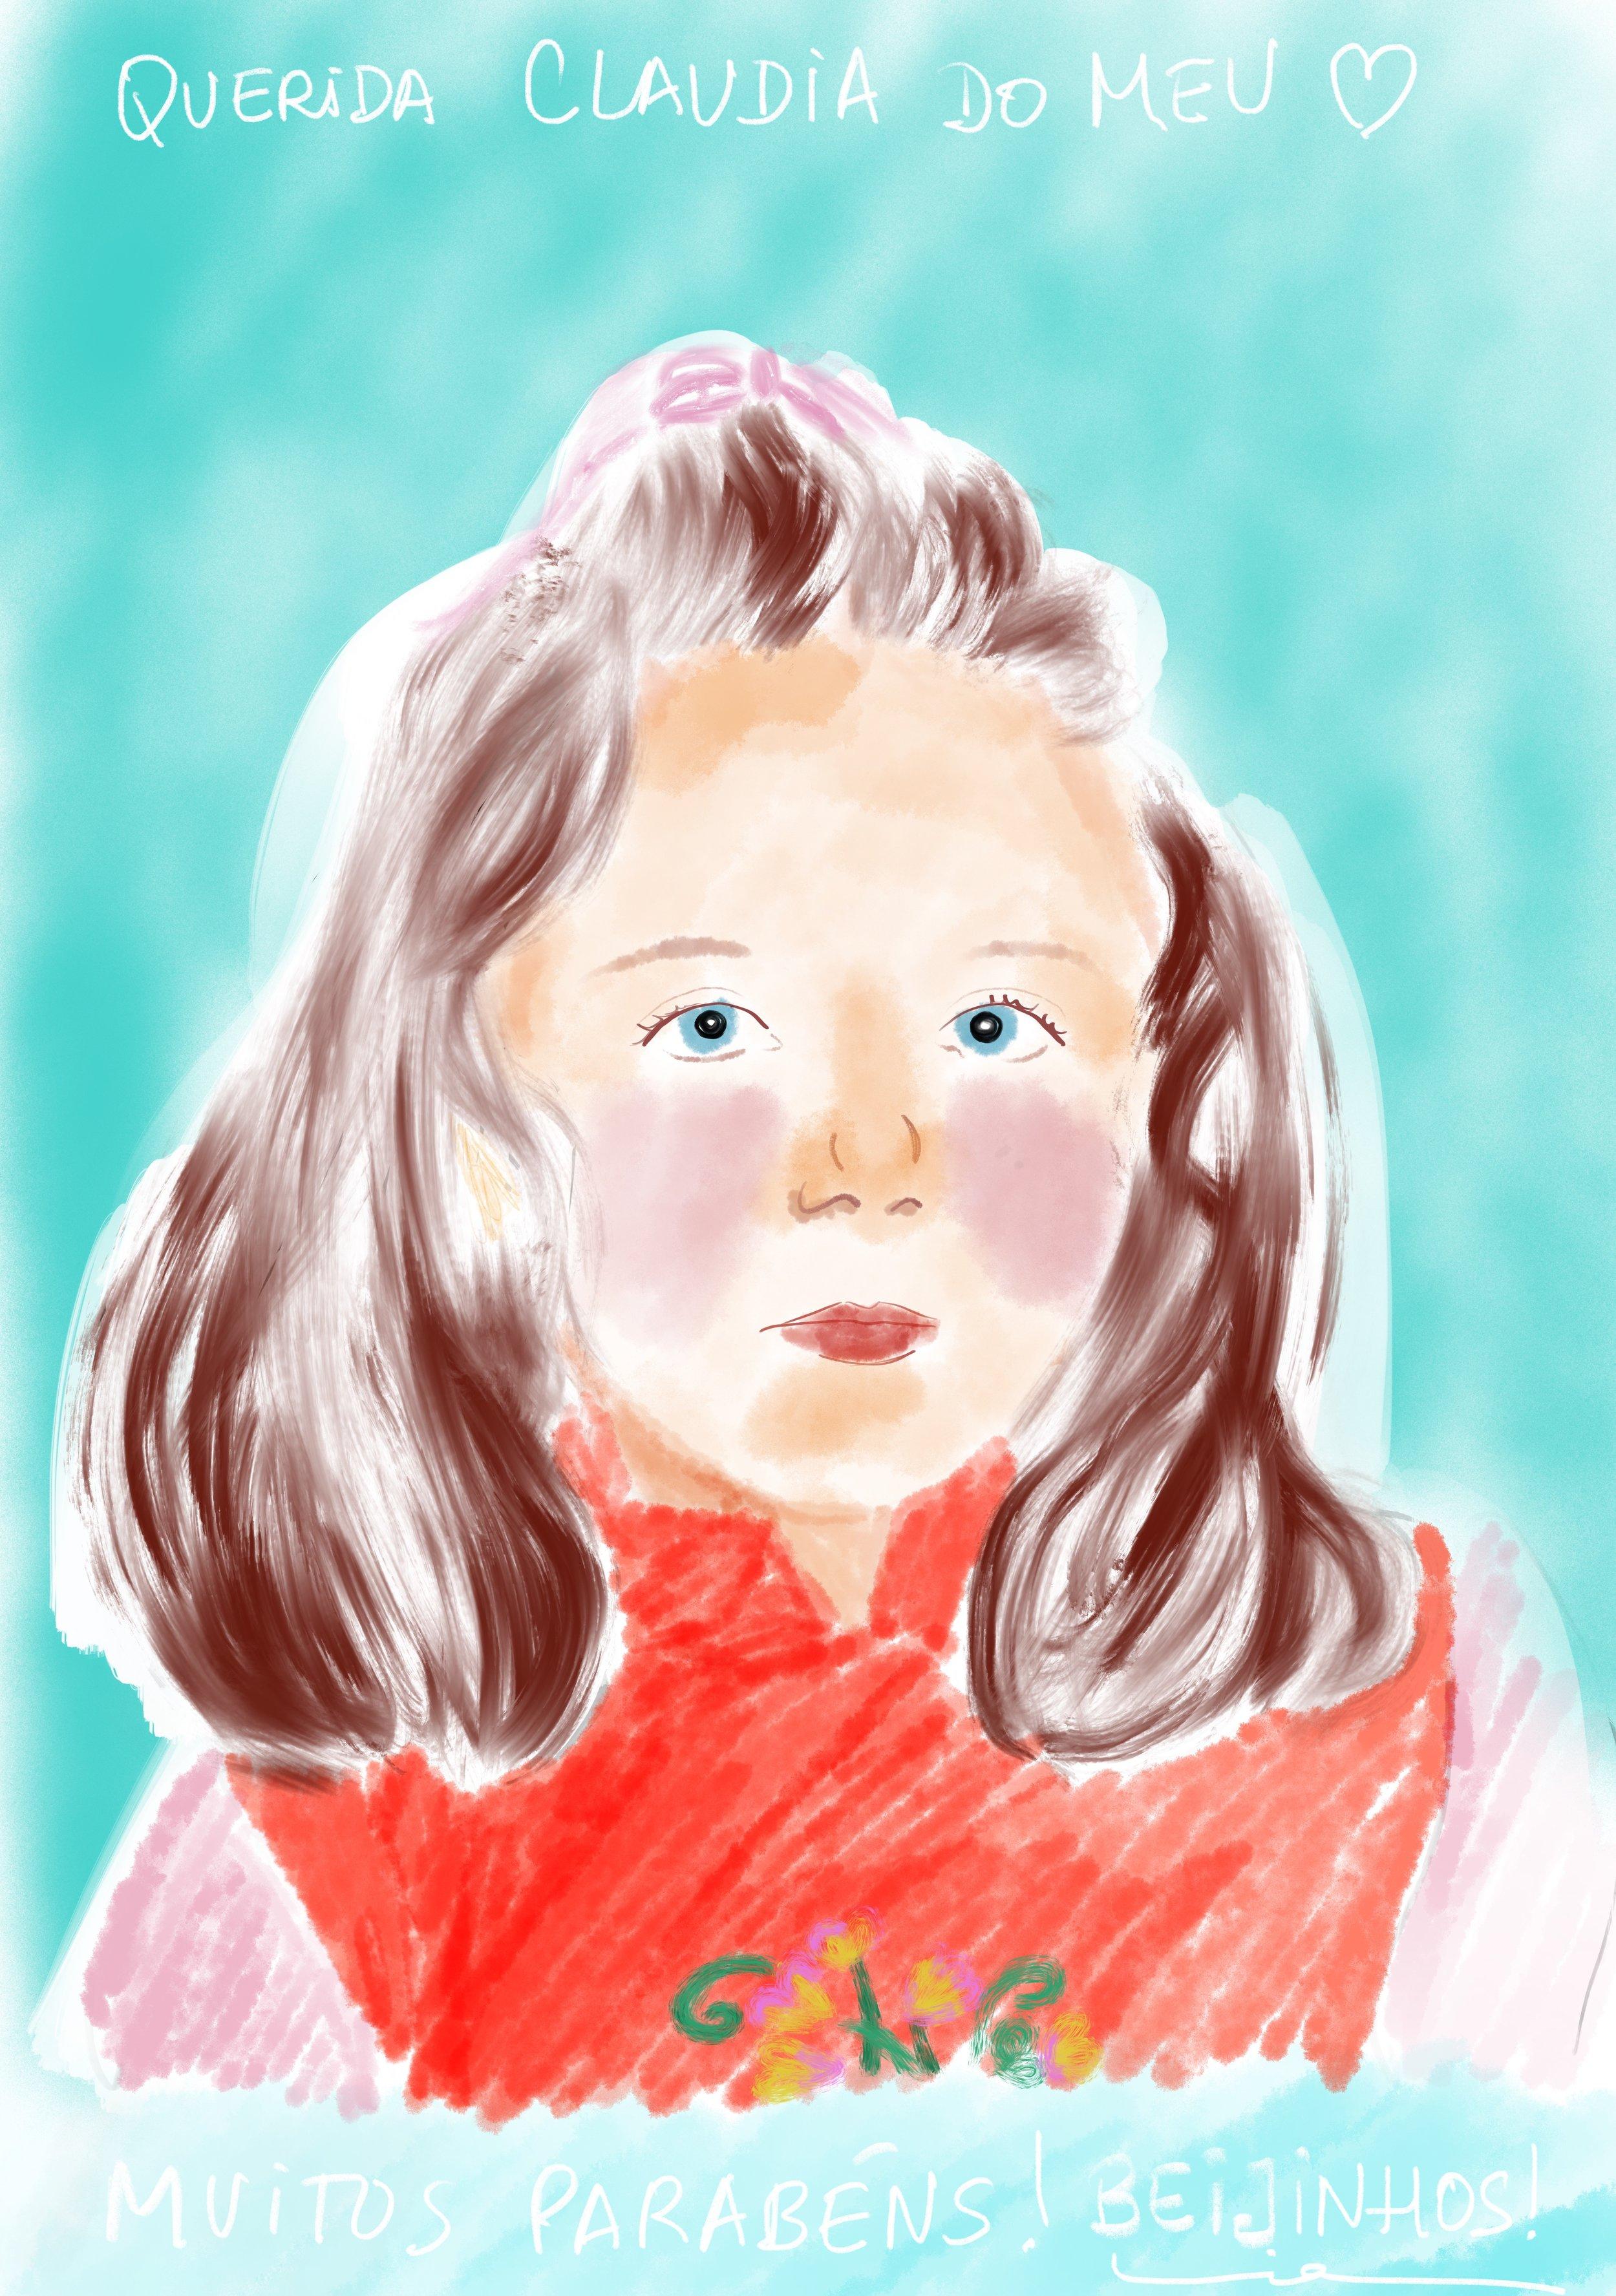 Cláudia_Pequena.jpg